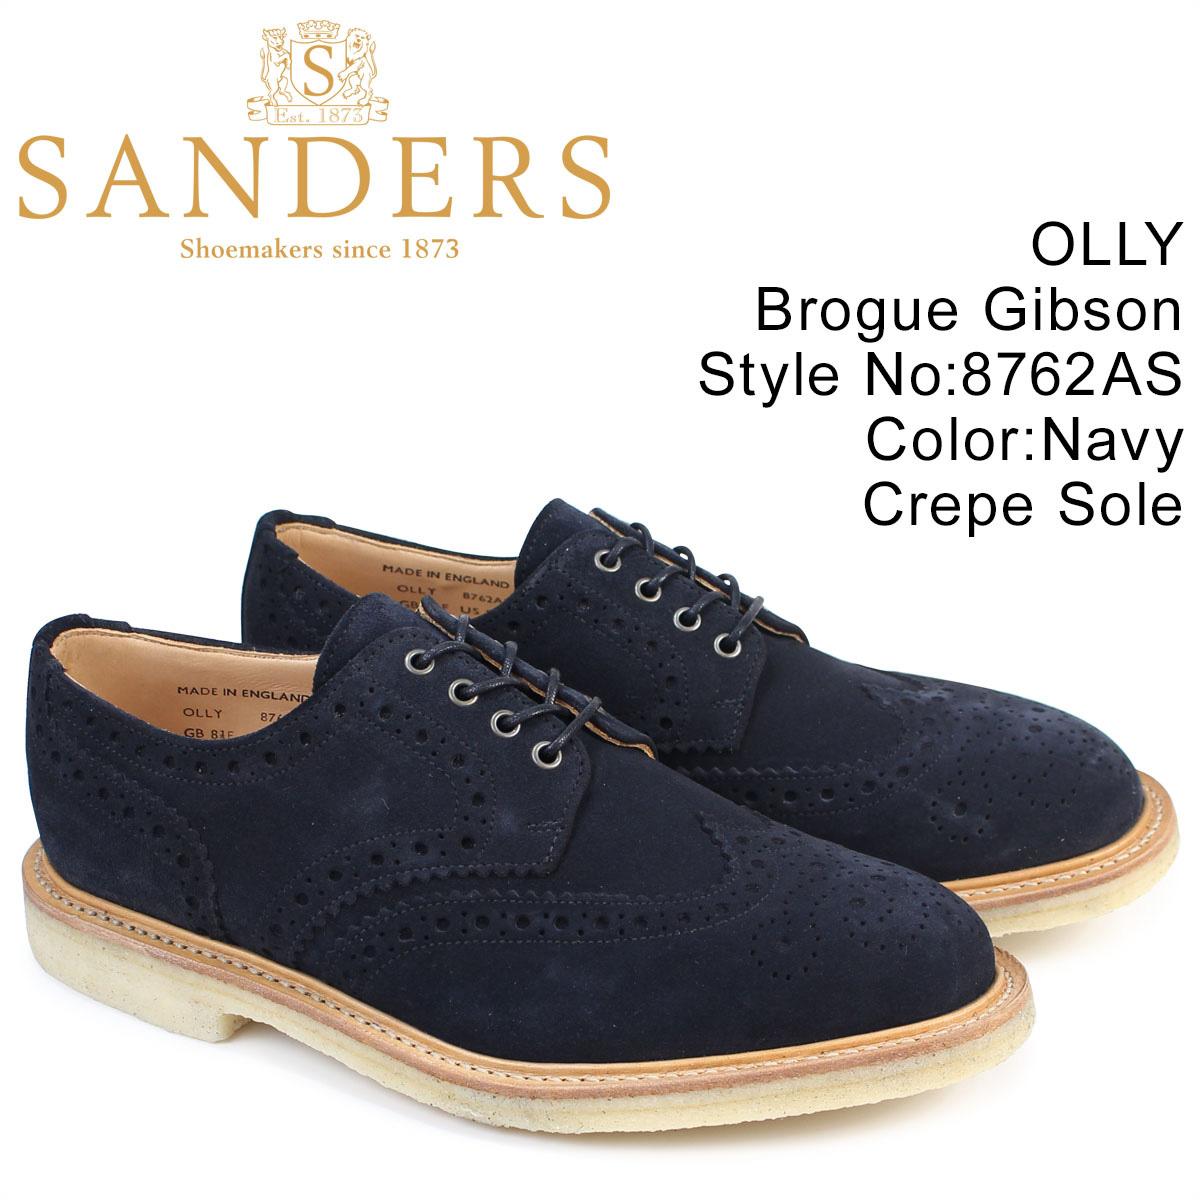 SANDERS 靴 サンダース ミリタリー オックスフォード シューズ ウイングチップ OLLY 8762AS メンズ ネイビー